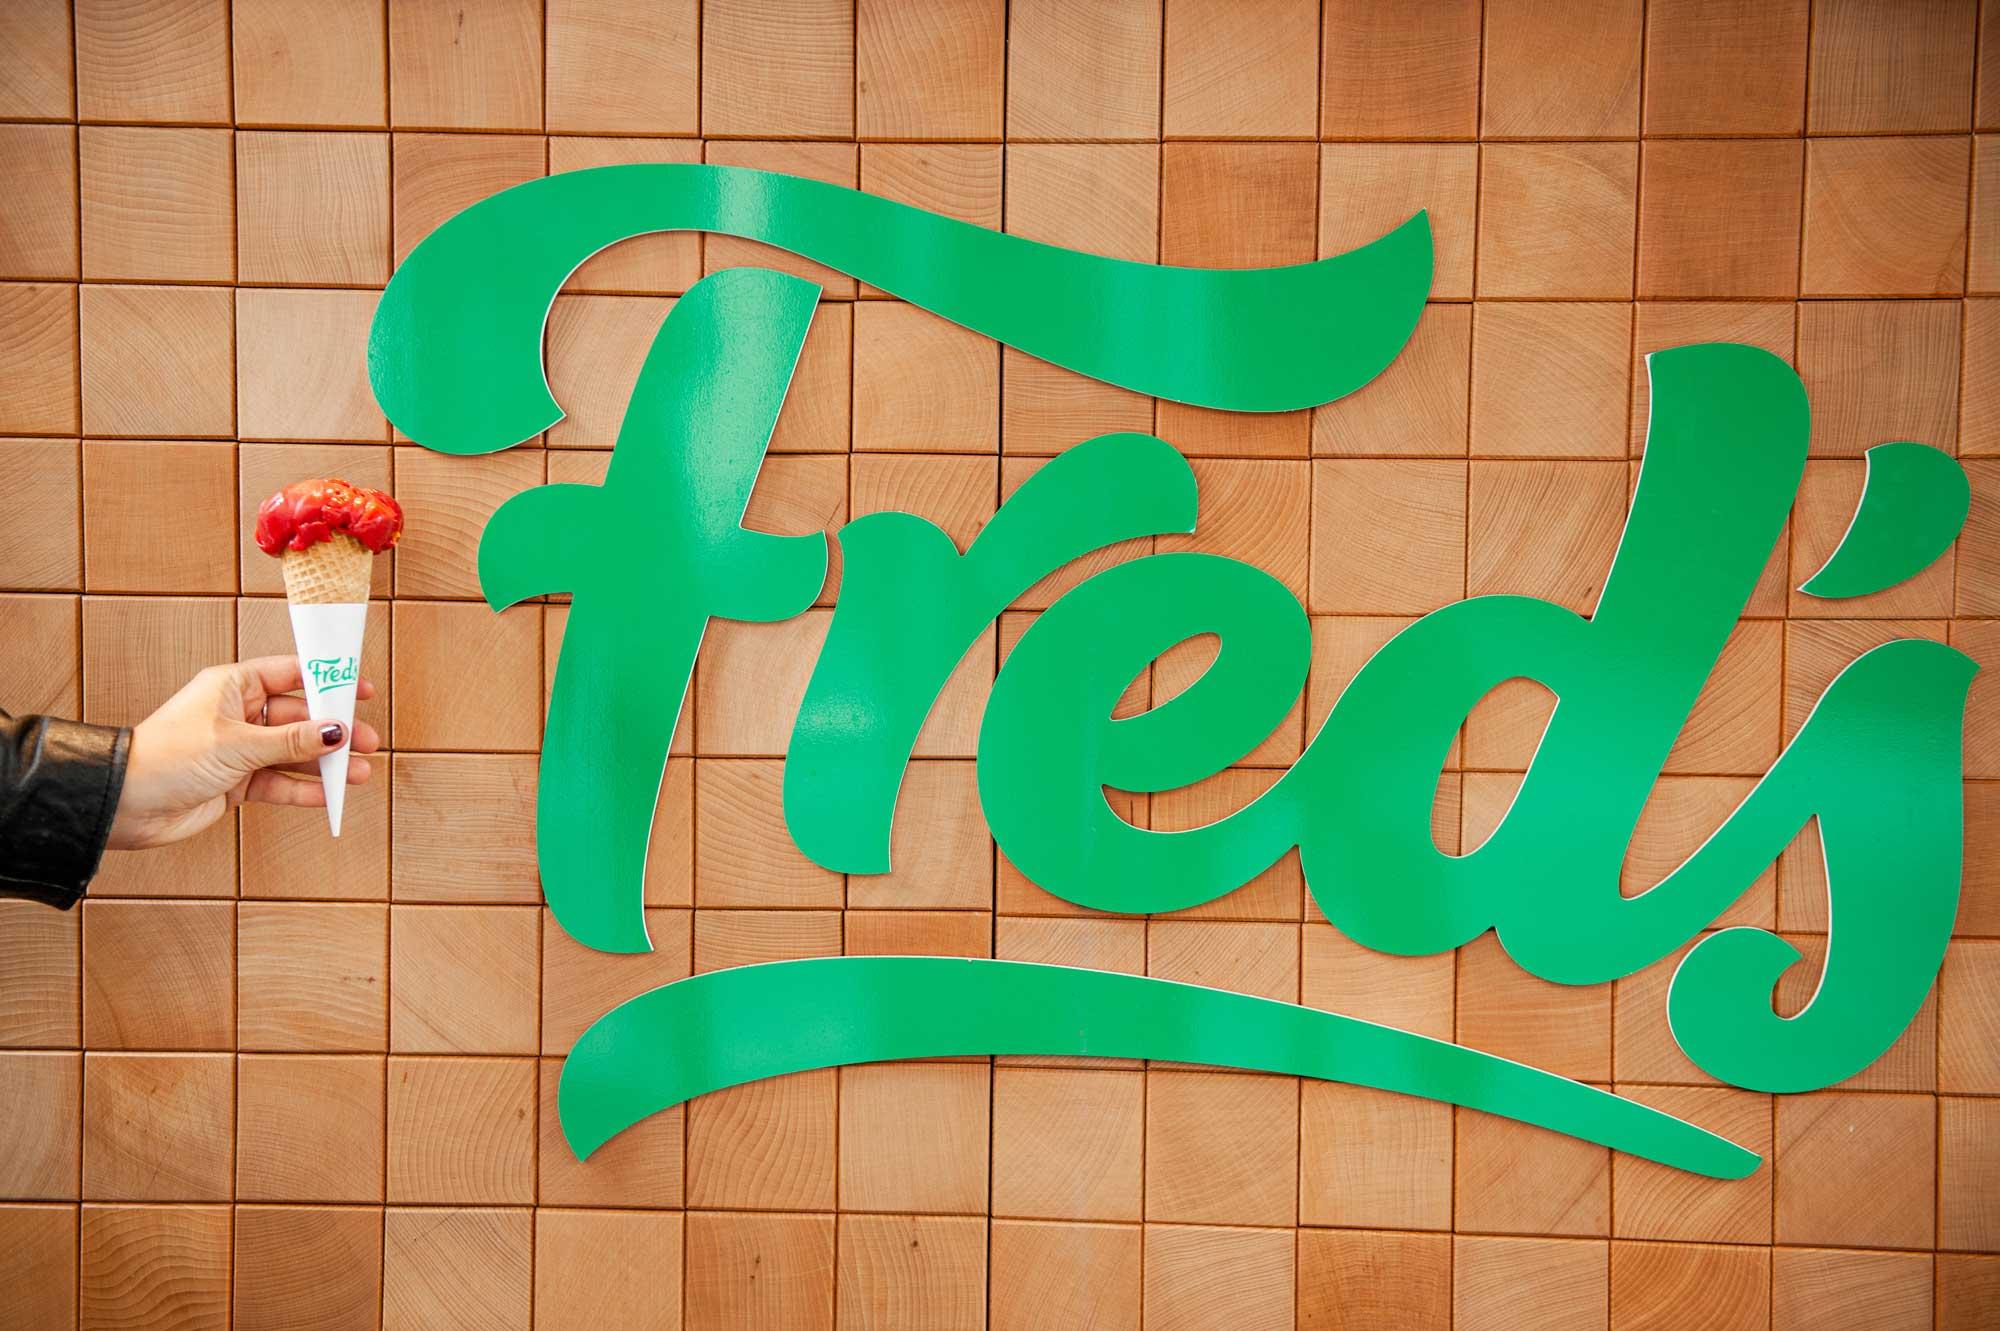 Fred's Paris